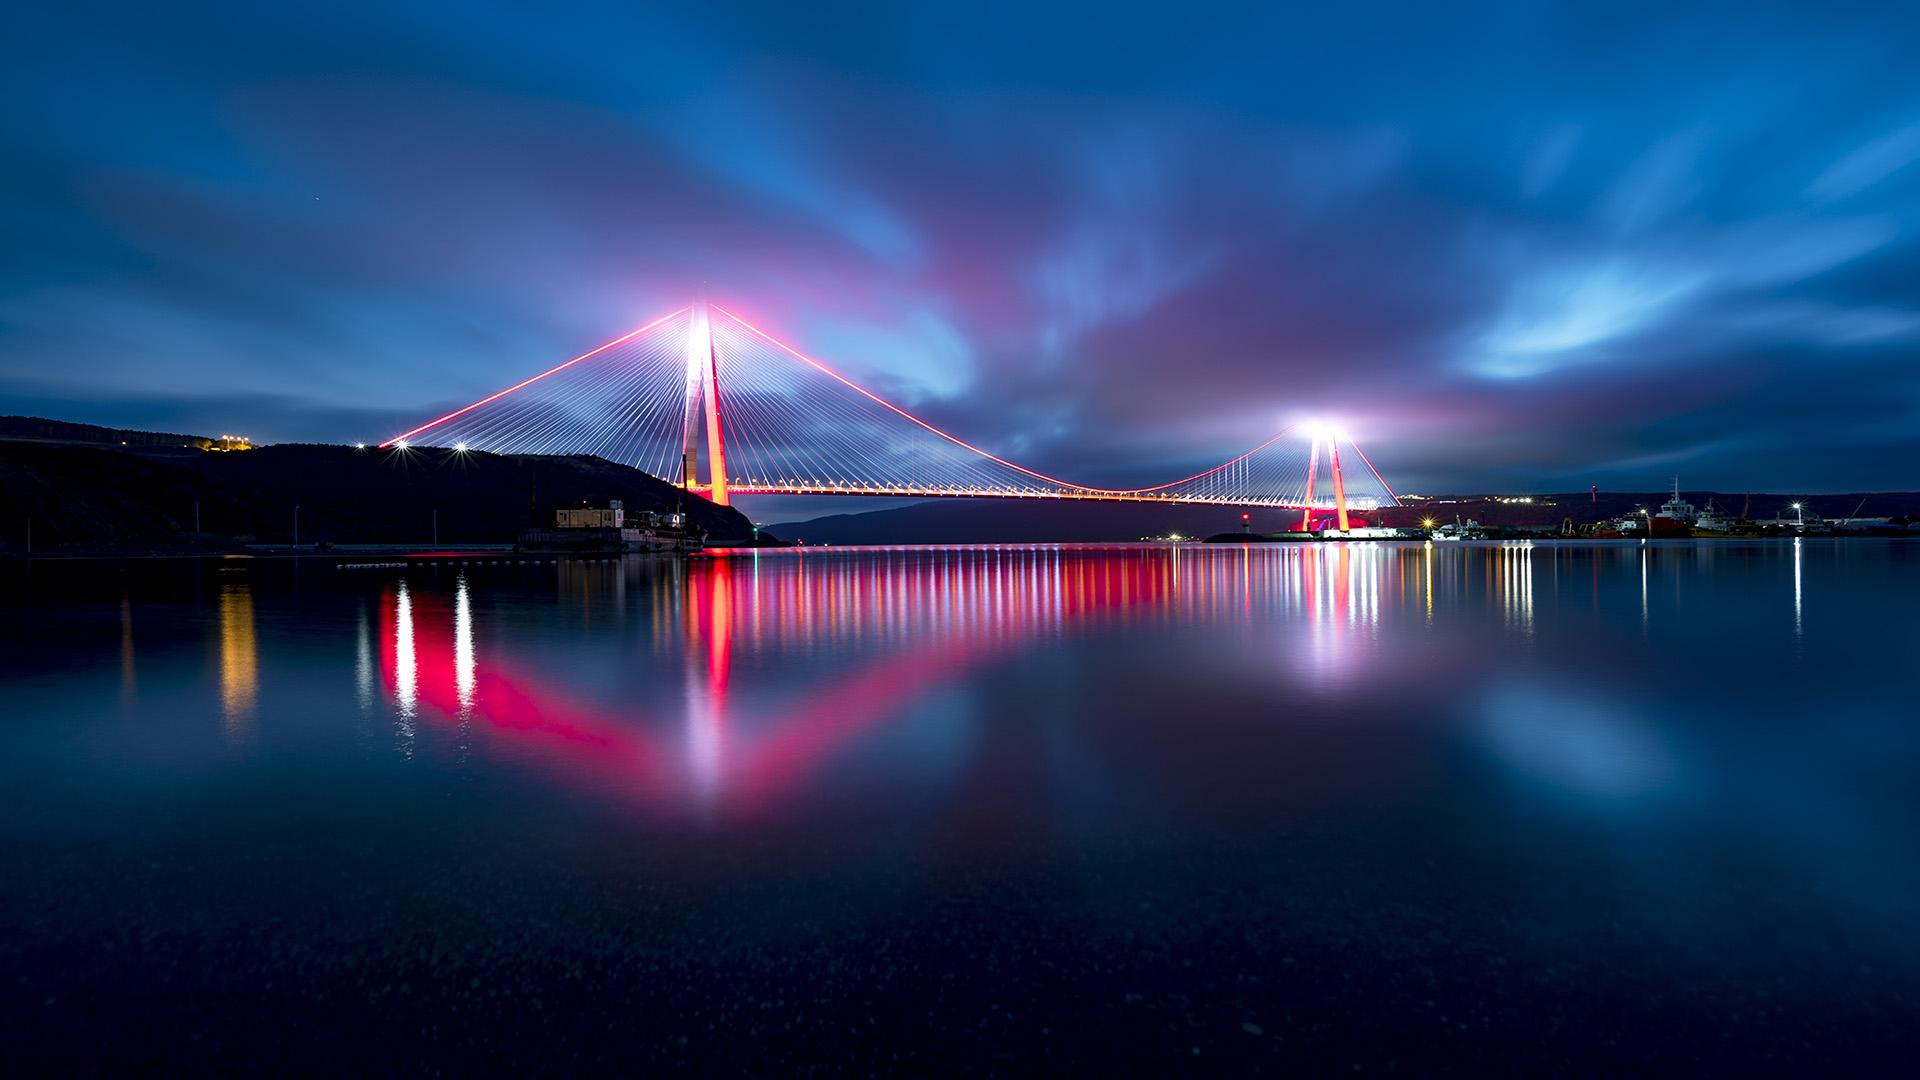 pink bridge over water inside turkey banner